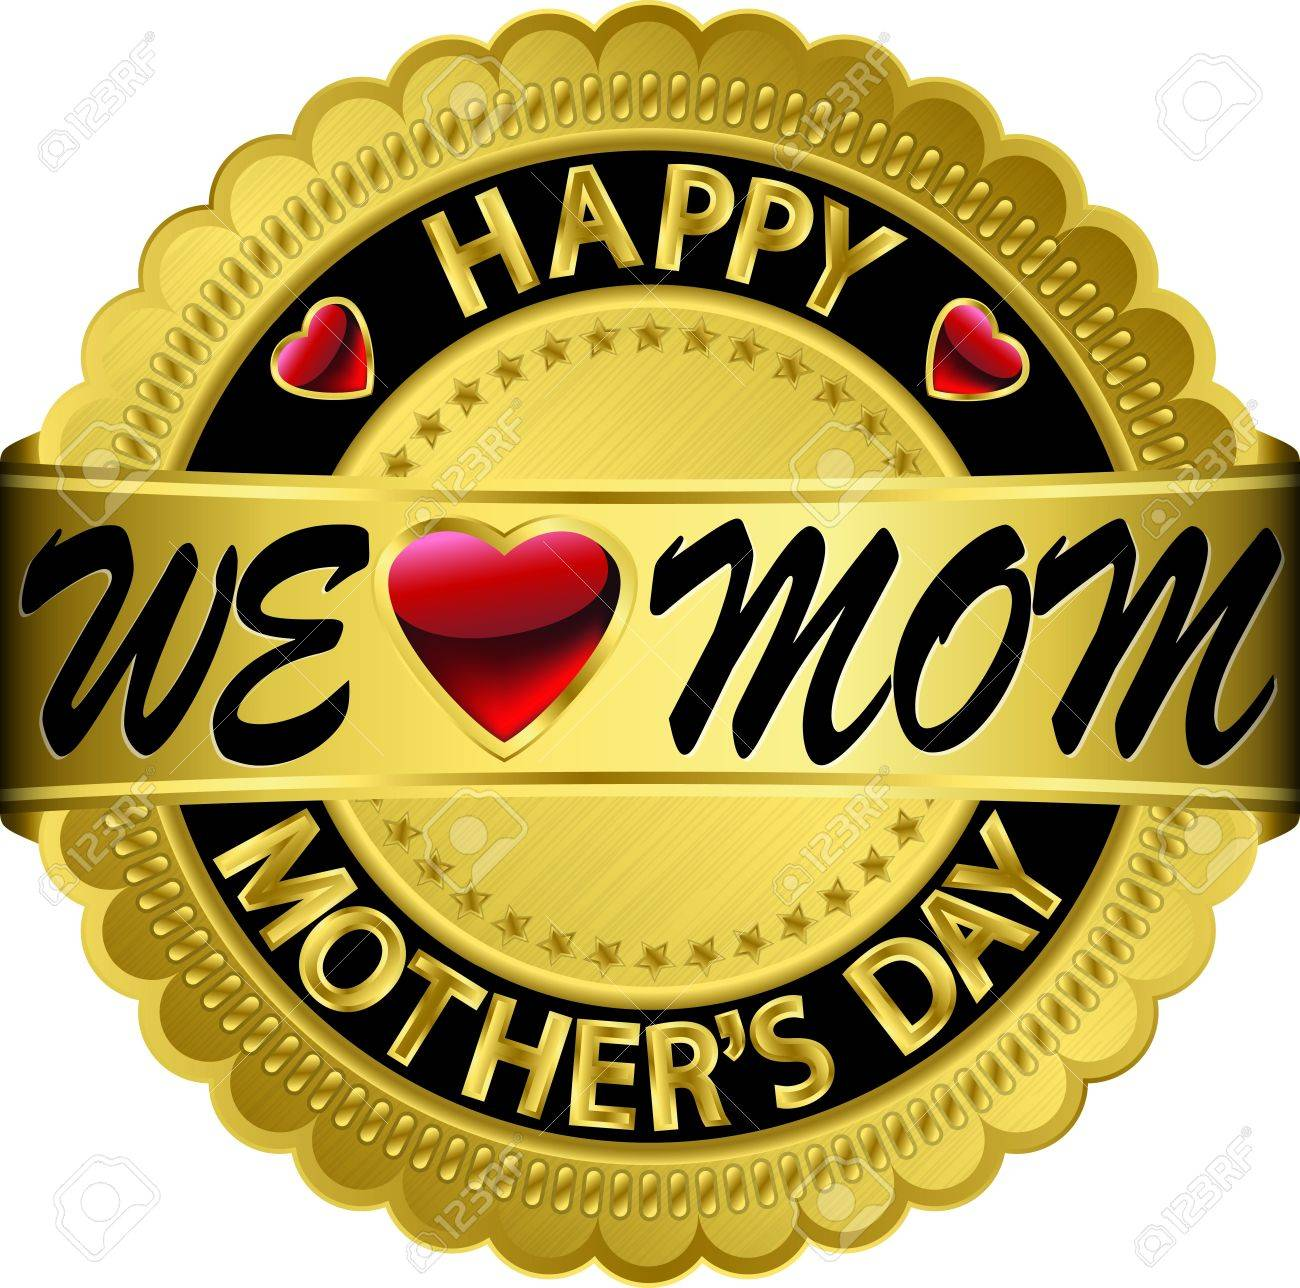 Happy mother s day golden label, vector illustration Stock Vector - 16540887